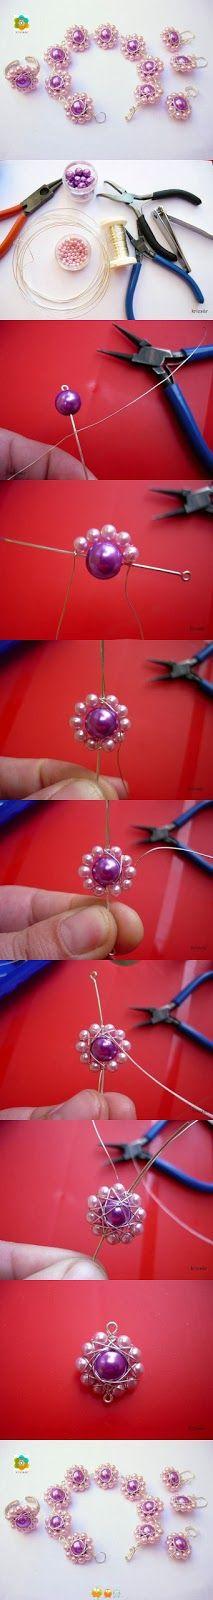 gunadesign, jewelry, wrapped wire, beads, flower